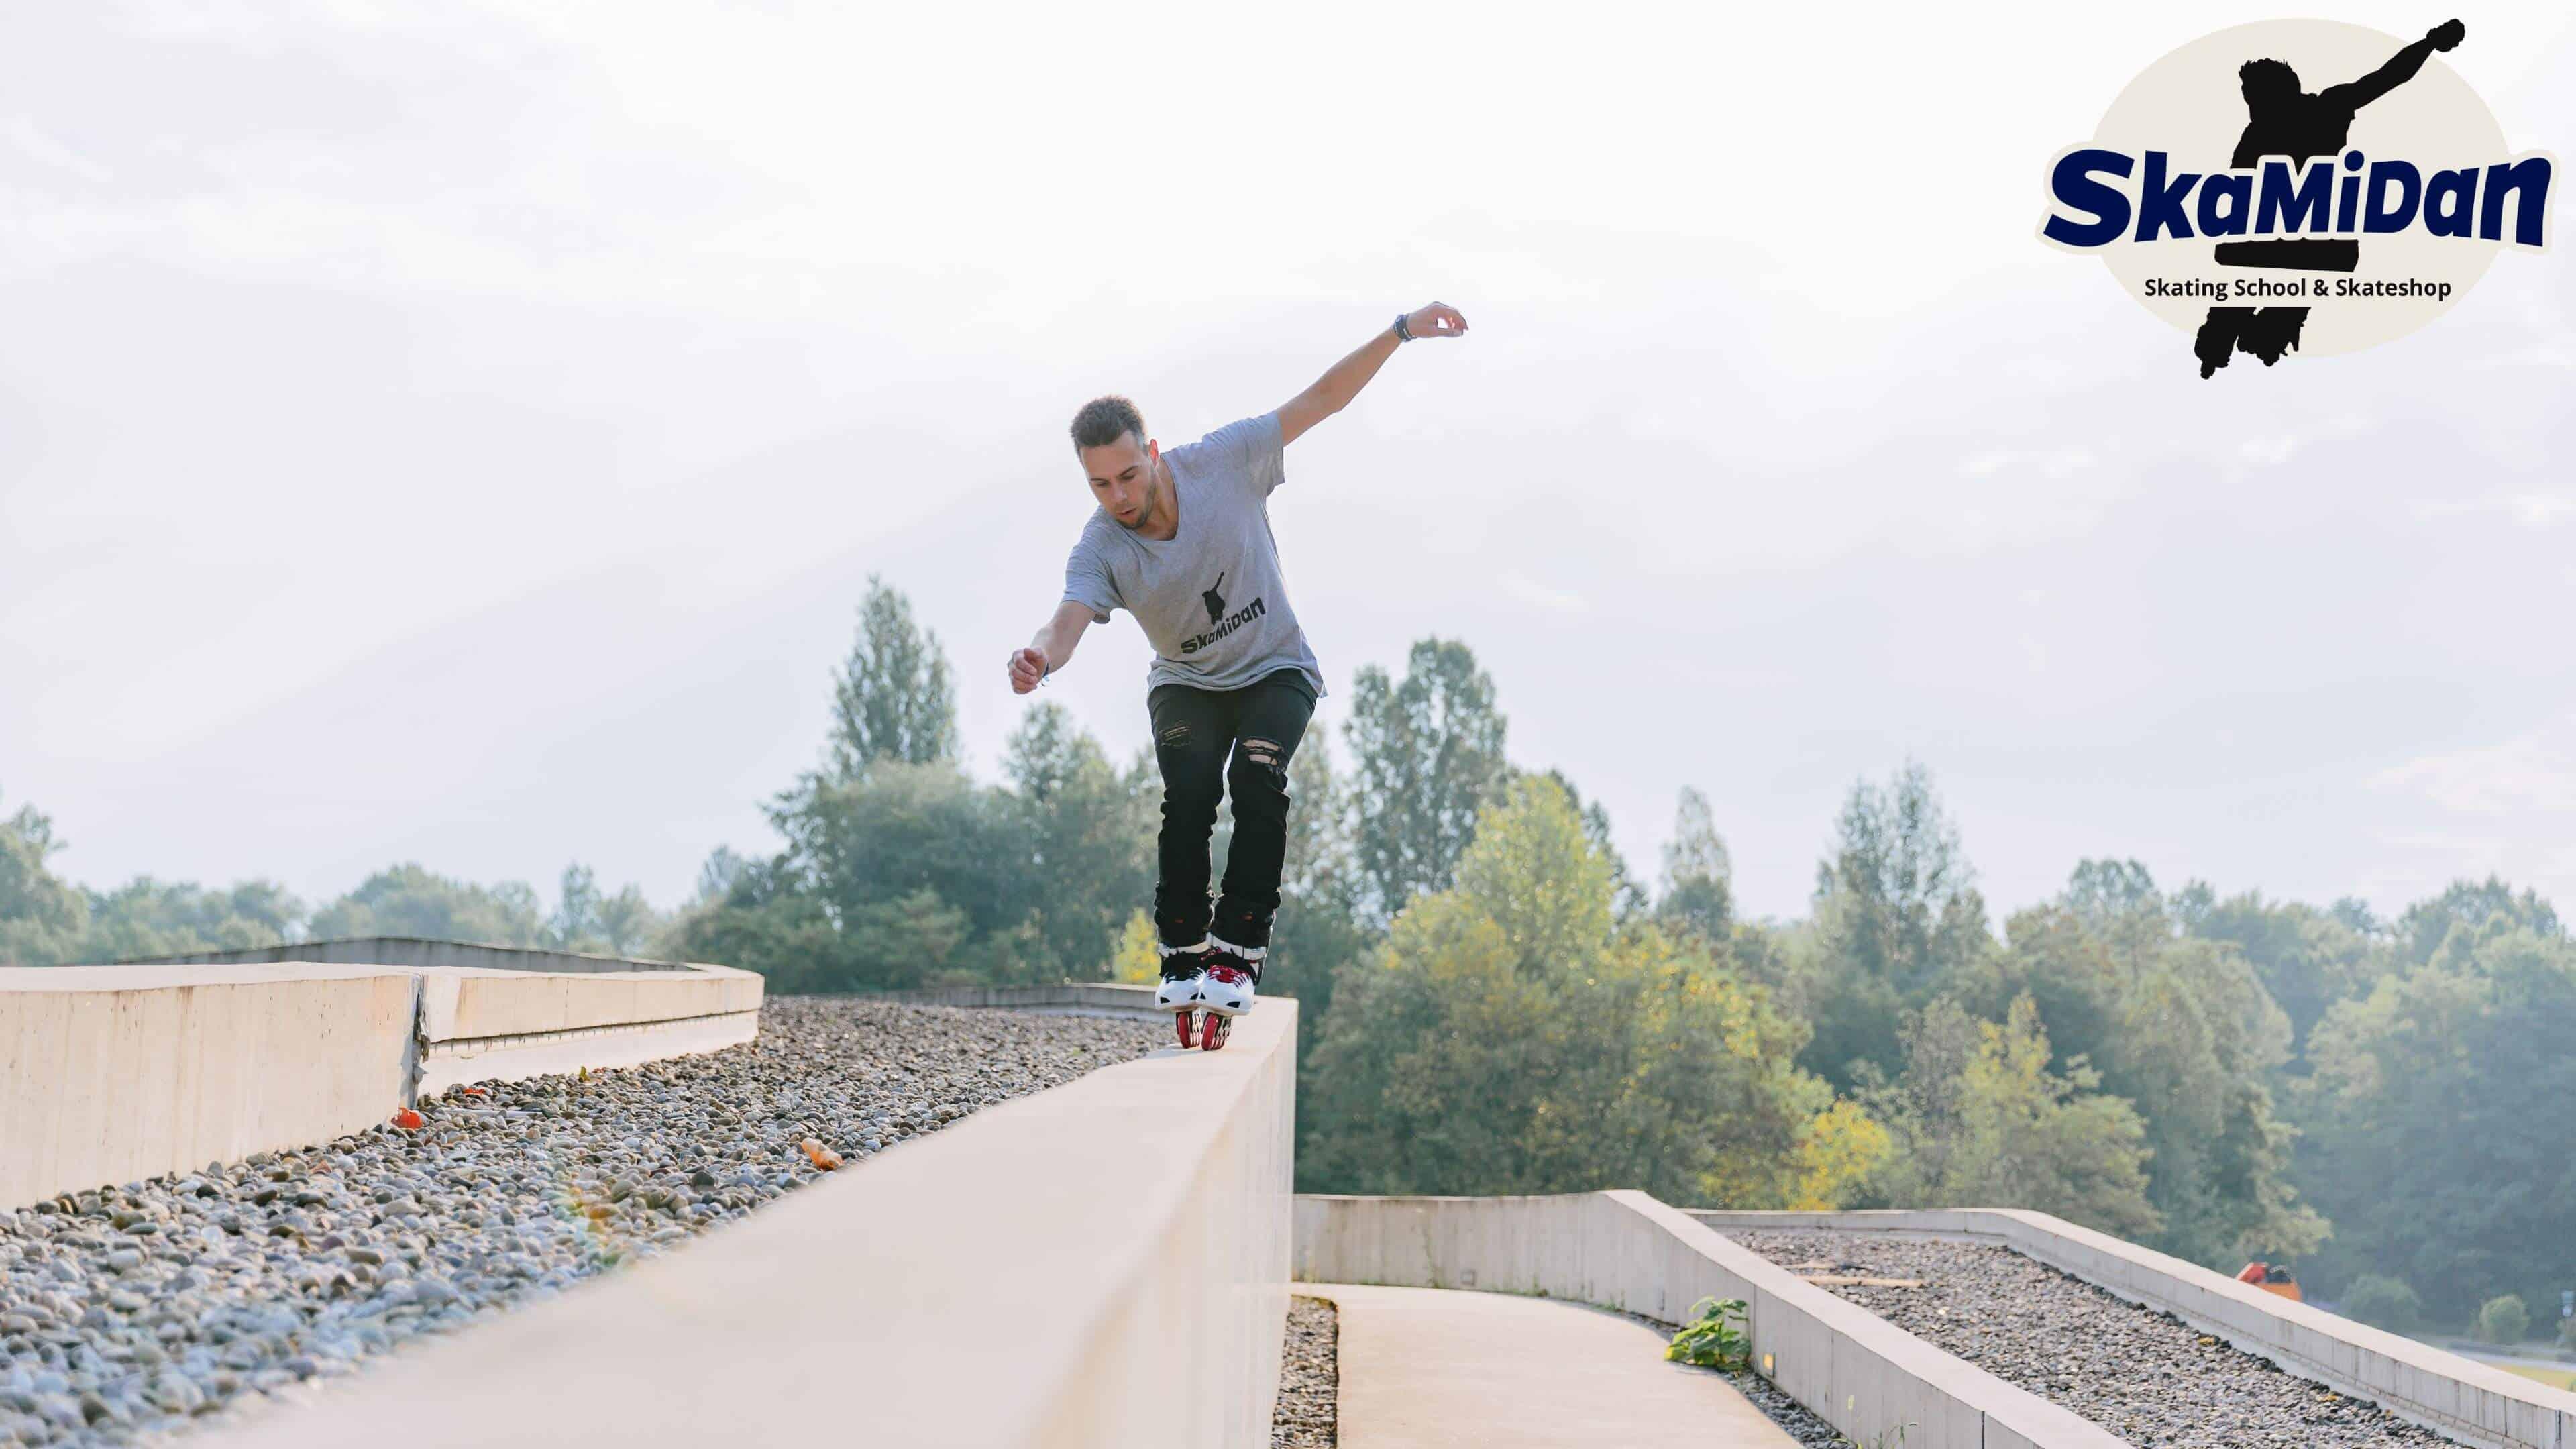 Skateschule SkaMiDan Weil am Rhein Basel Lörrach und Region Inline Skating Disziplinen Urban Skating